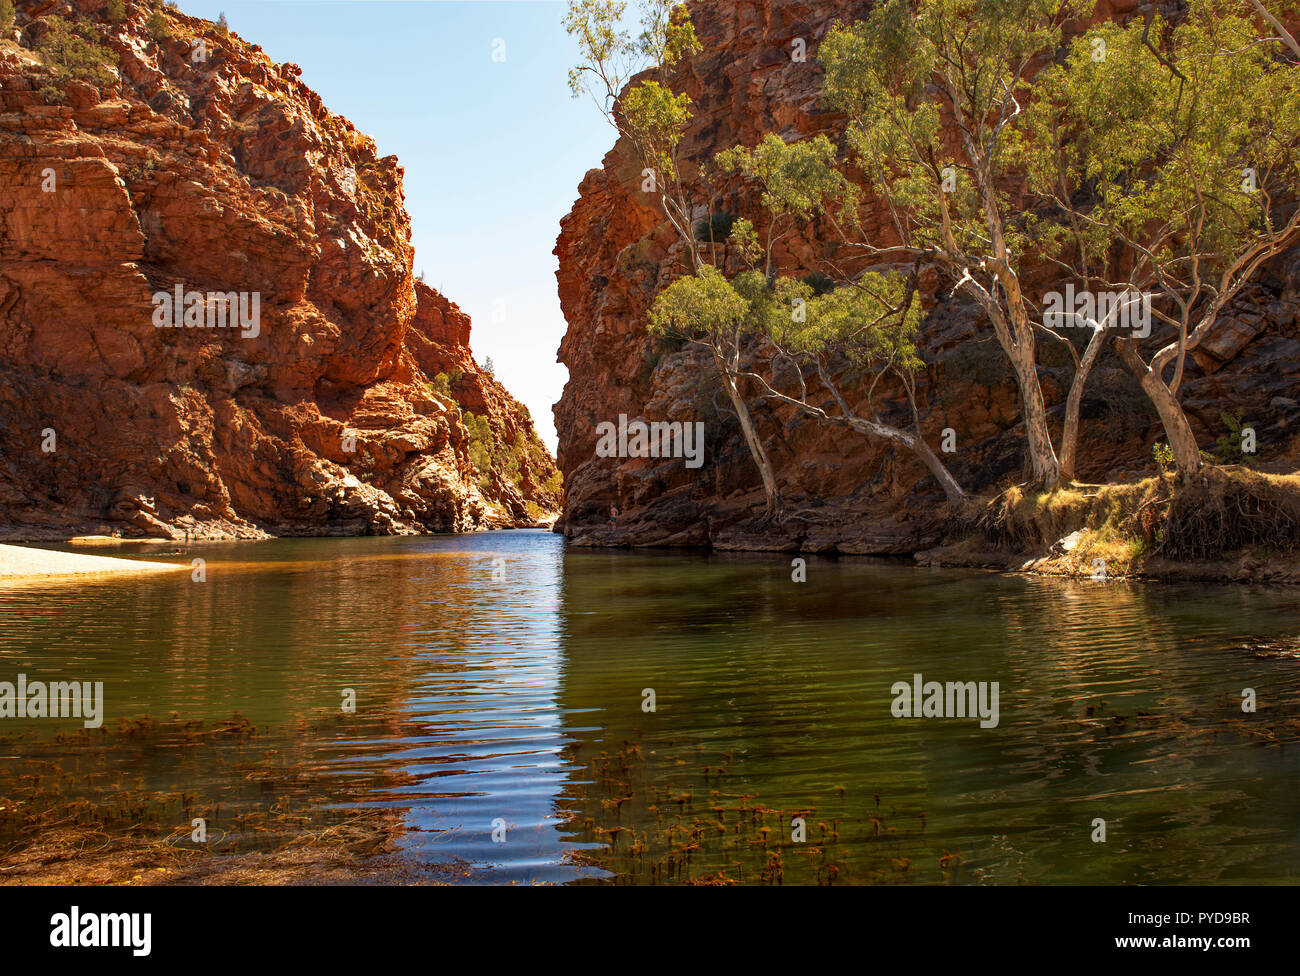 Ellery Creek Big Hole, MacDonnell Ranges, Northern Territory, Australia - Stock Image